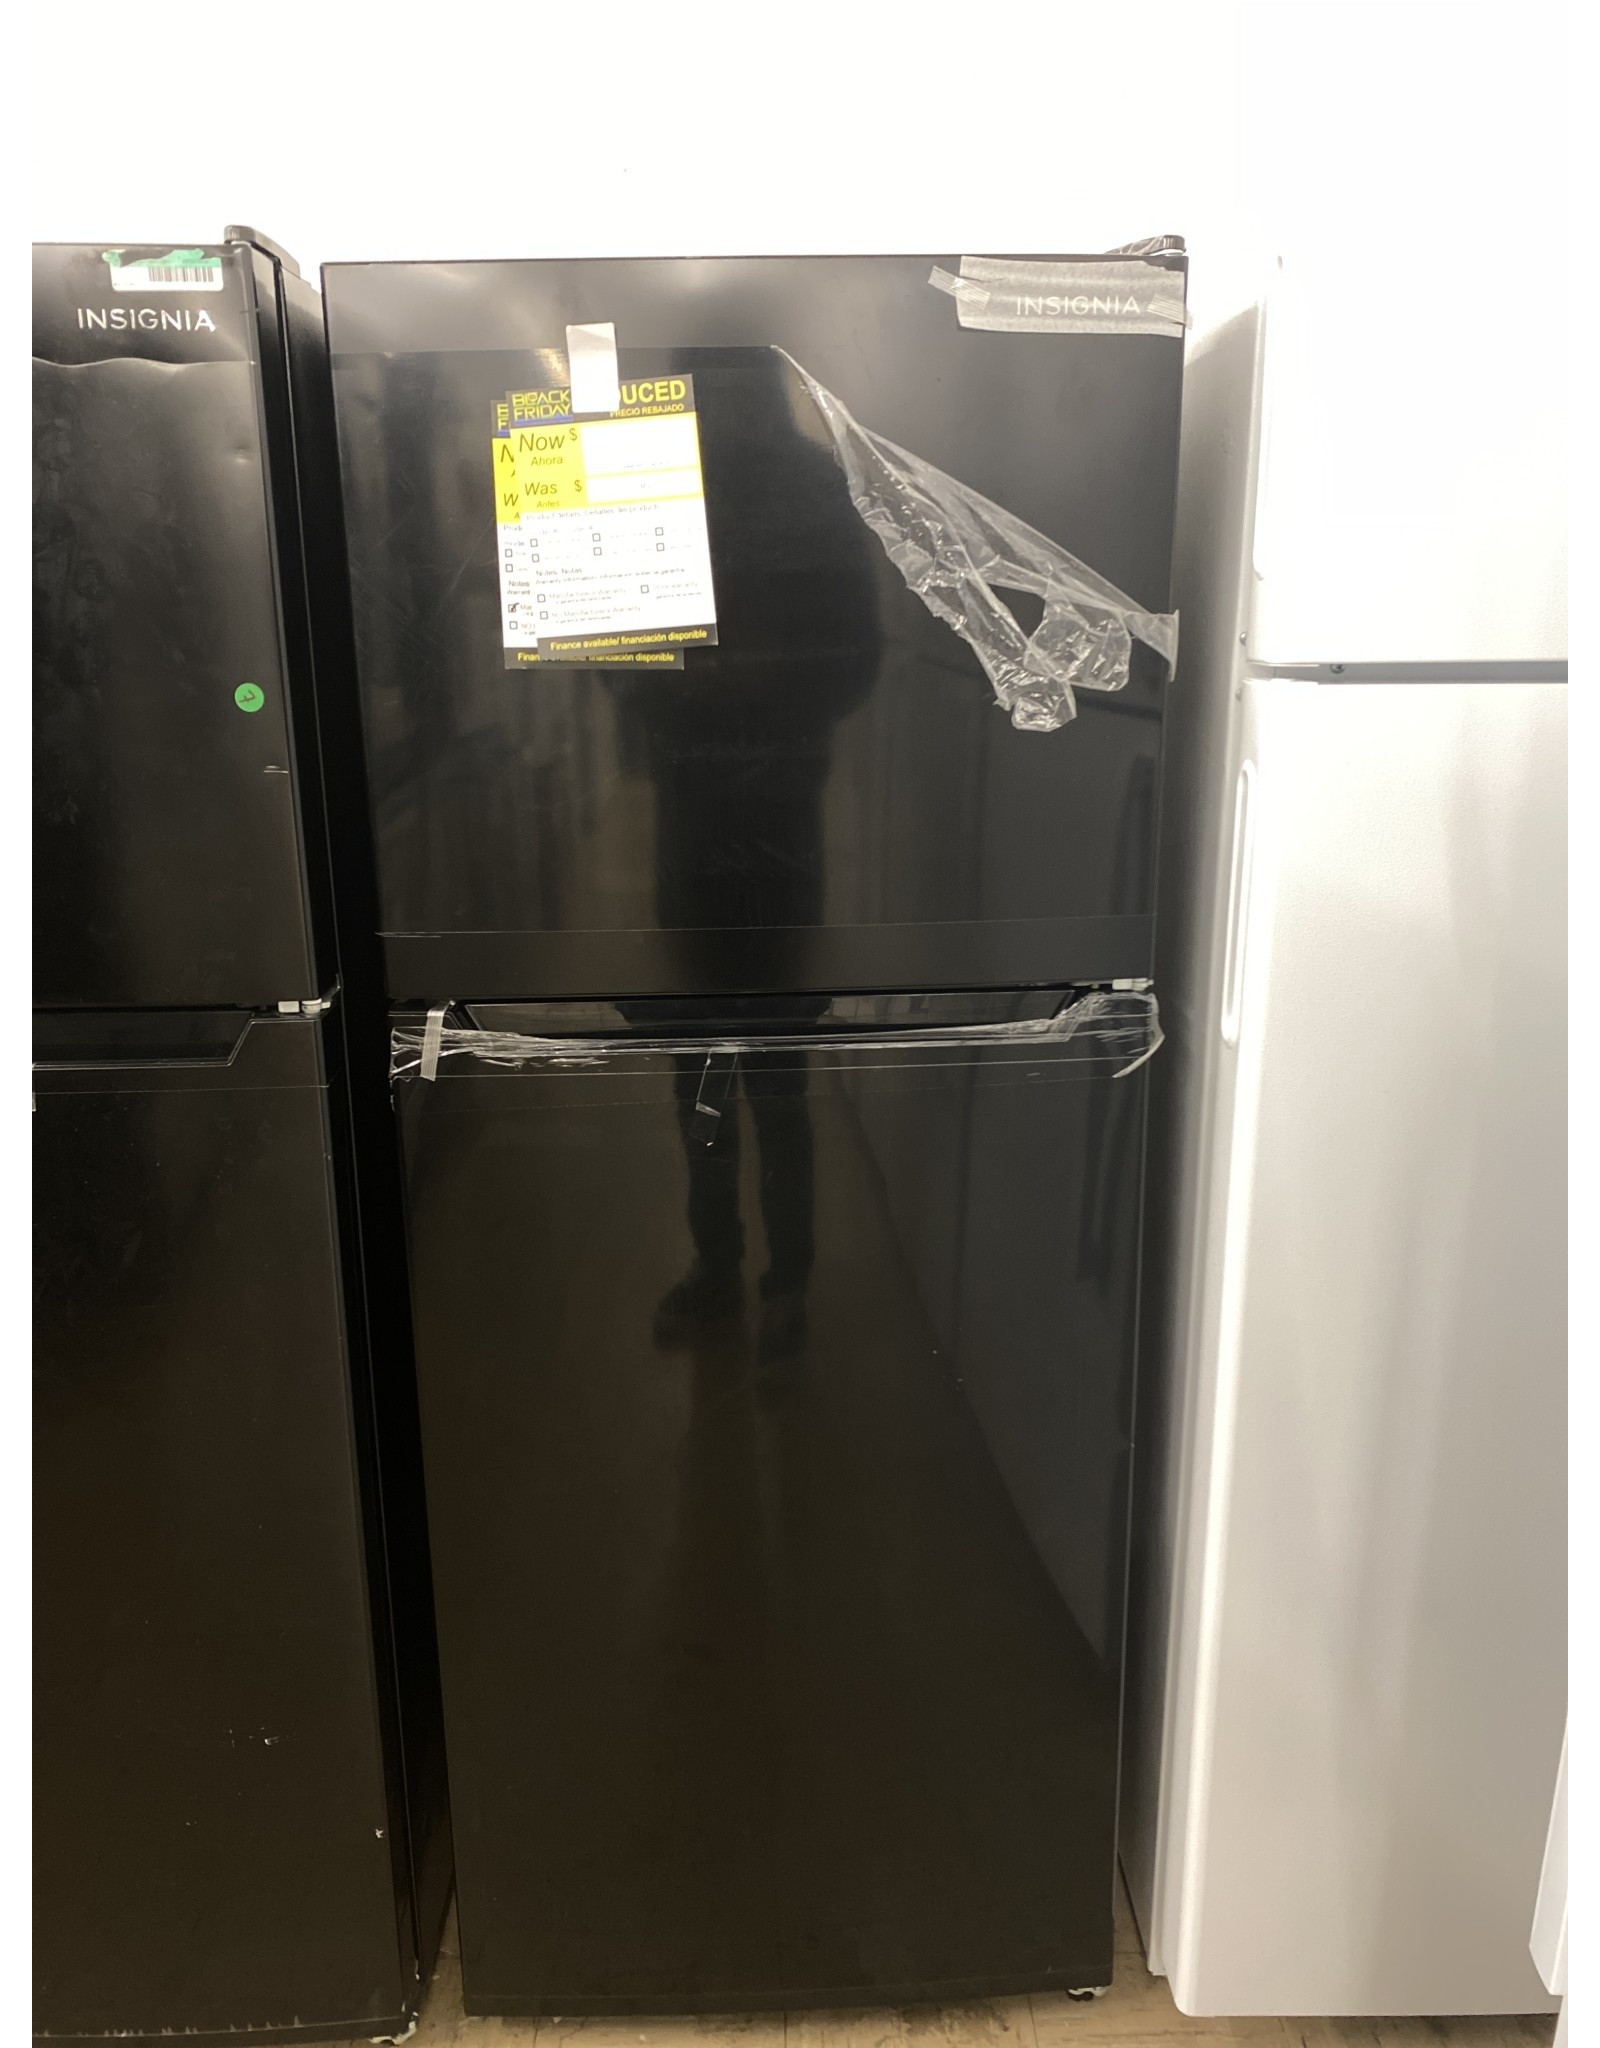 Insignia™ NS-RTM10BK0 Insignia™ - 10.5 Cu. Ft. Top-Freezer Refrigerator - Black